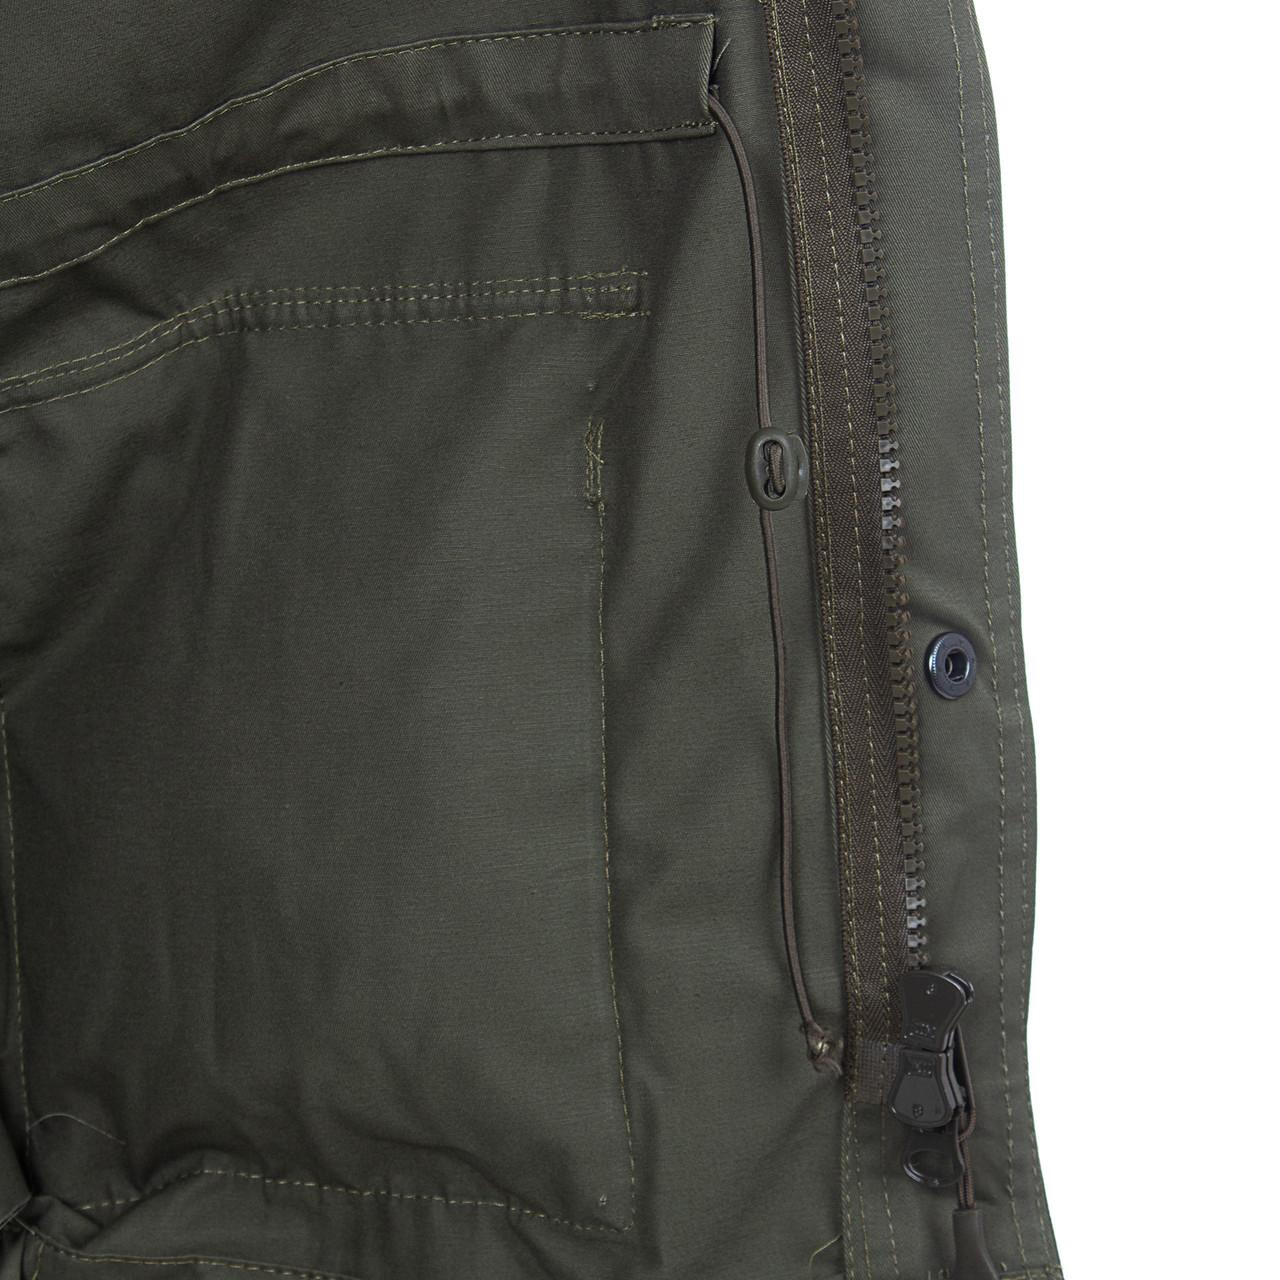 Костюм для охоты и рыбалки летний Крафт М-65 цвет Хаки ткань Cotton - фото 4